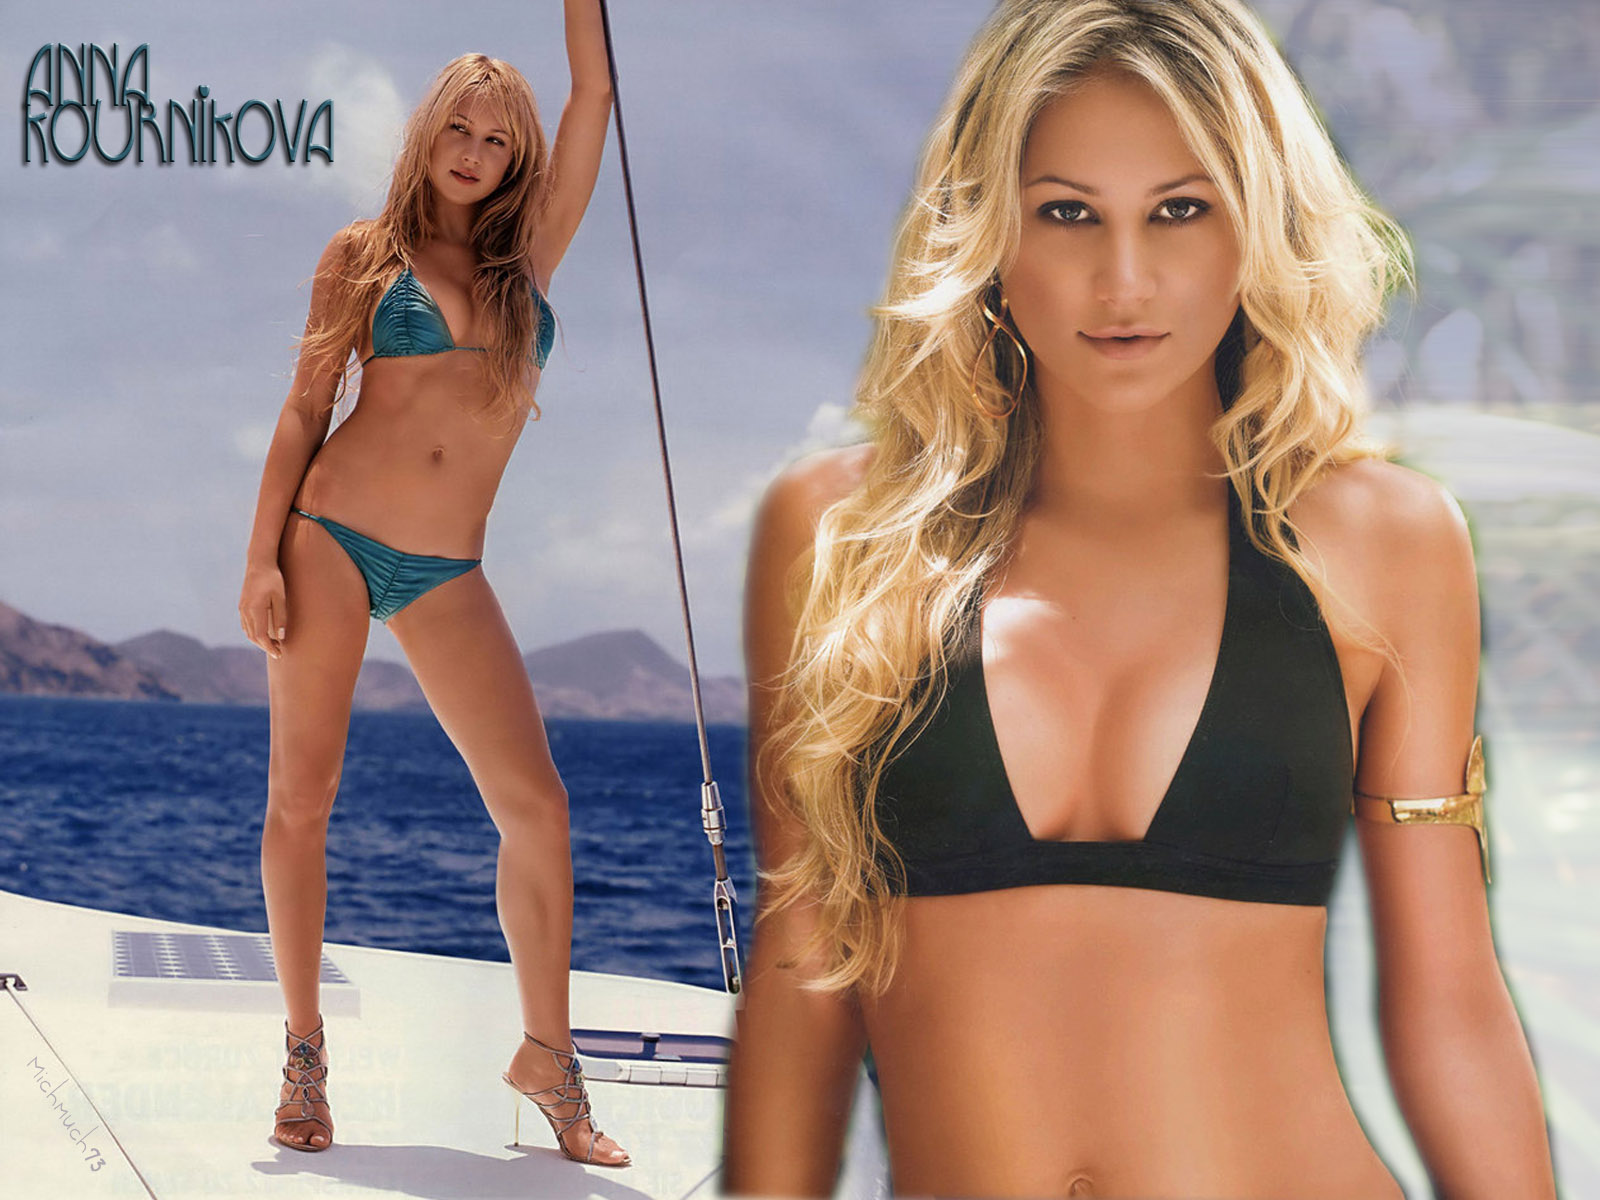 http://4.bp.blogspot.com/-dprjl2rID_w/UMb5wOfpr7I/AAAAAAAAARc/4YYb5yjOfFo/s1600/Anna+Kournikova+Hot.jpg